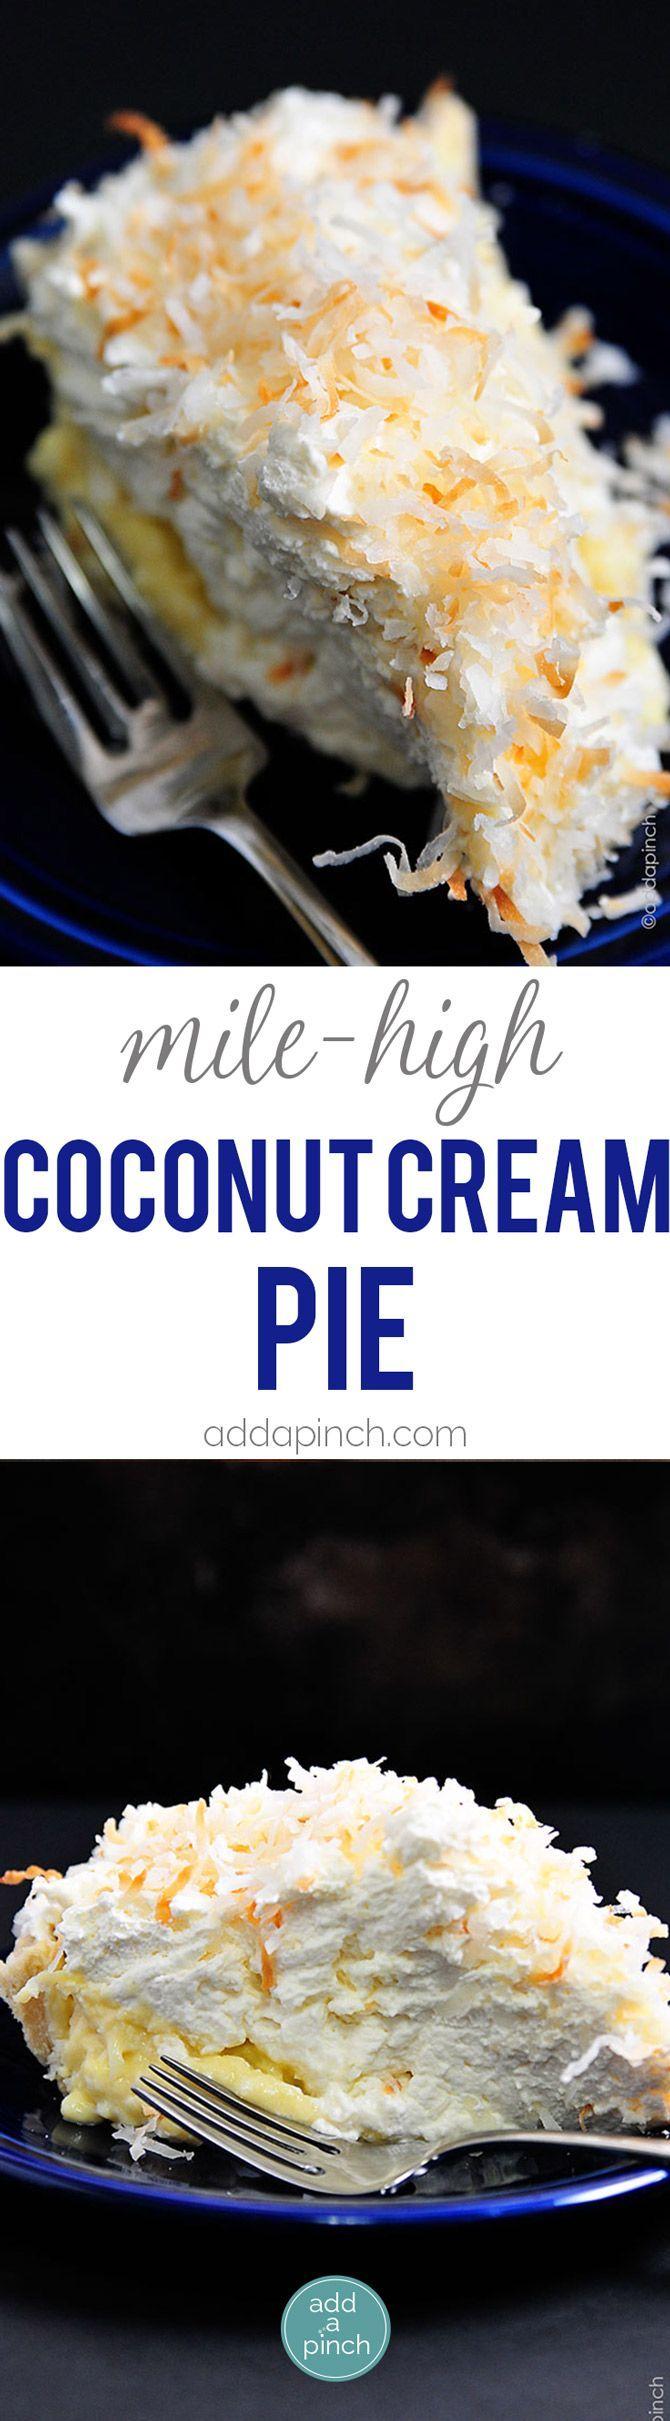 Coconut Cream Pie Recipe - Coconut Cream Pie is a classic. This creamy, dreamy…